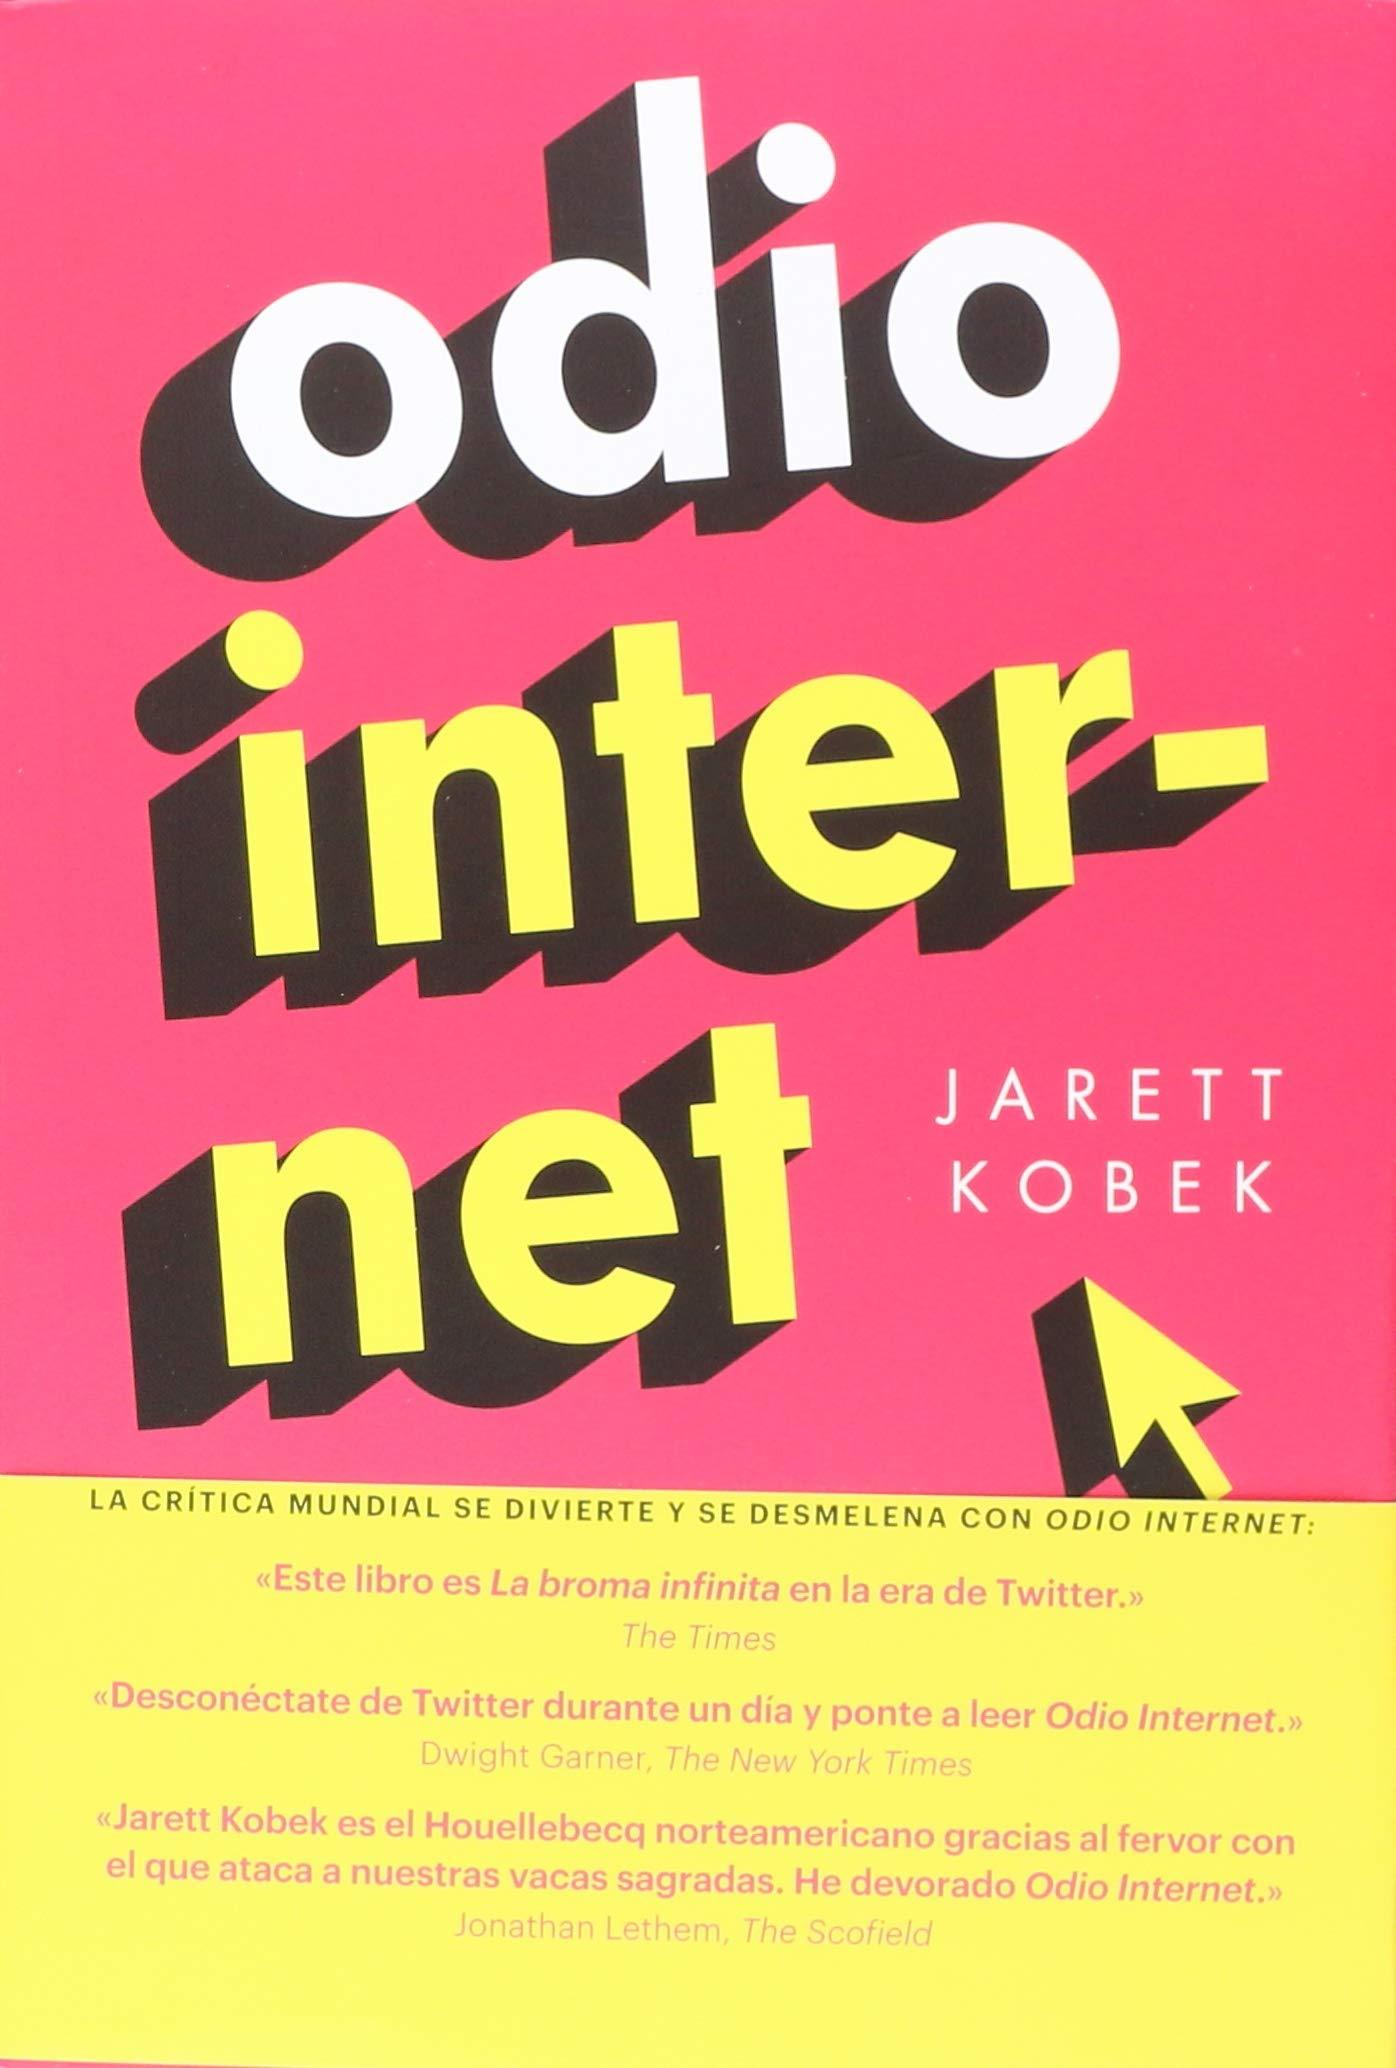 ODIO INTERNET (LITERATURAS): Amazon.es: Kobek, Jarett, Salmerón Arjona, Juan Manuel: Libros